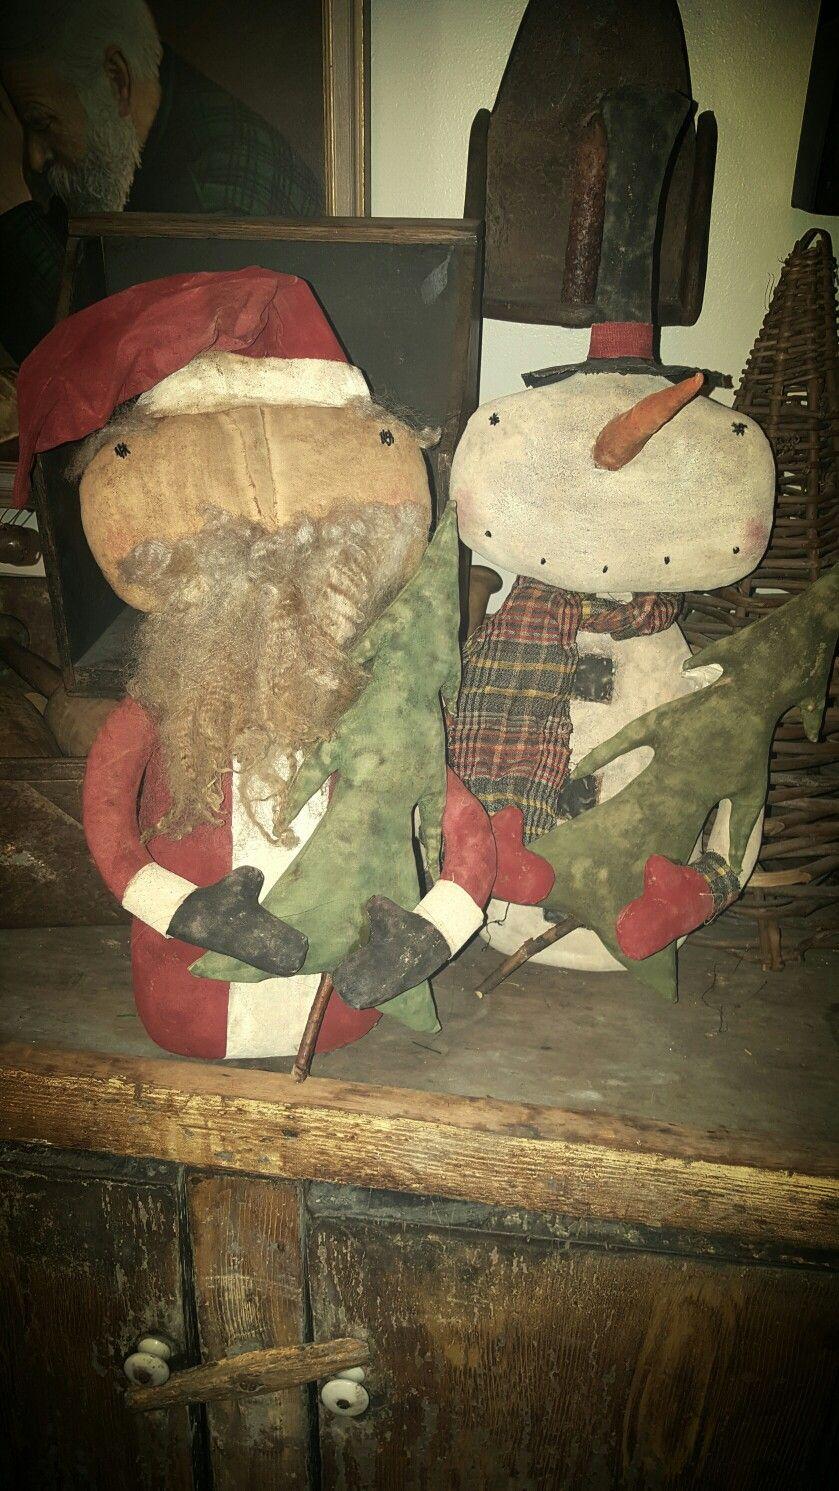 primitive christmas crafts prim christmas holiday crafts christmas decor snowmen primitives november christmas deco november born - Primitive Christmas Crafts